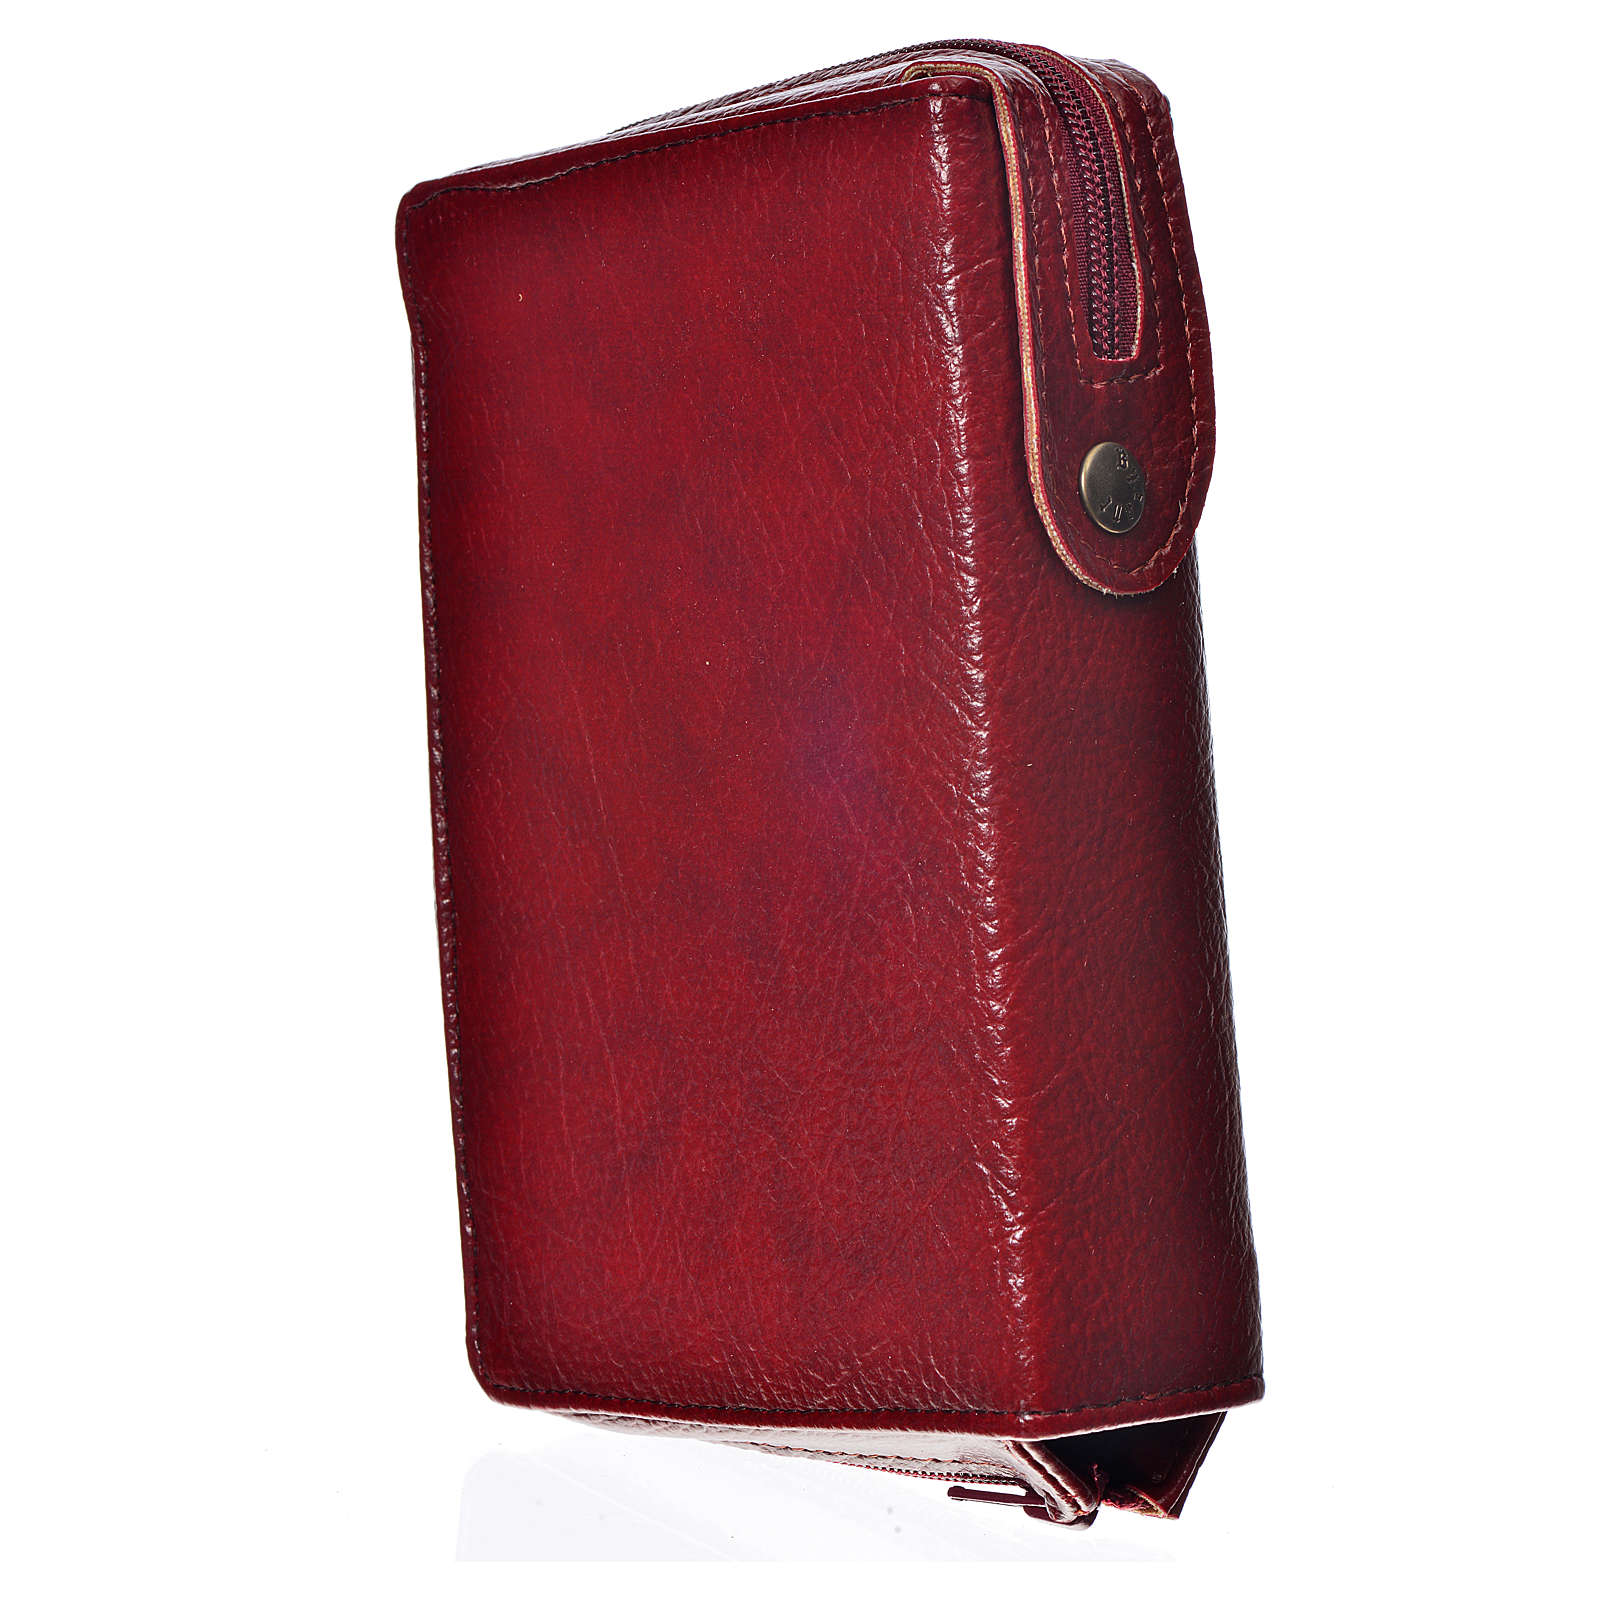 Funda Biblia CEE grande burdeos simil cuero S. Familia 4